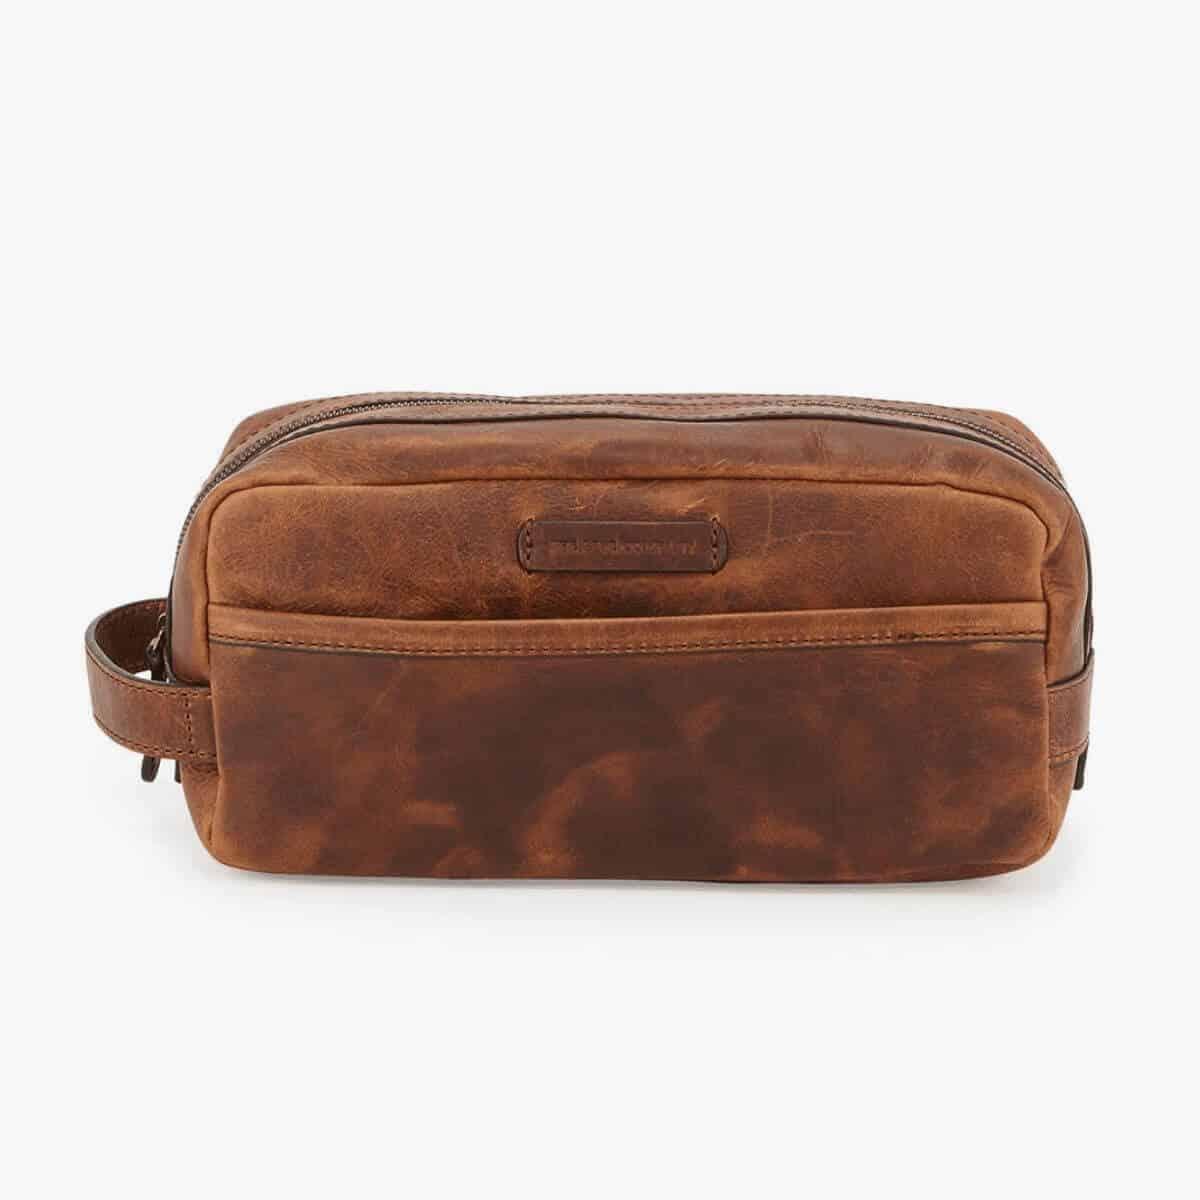 Cognac leather Dopp kit.